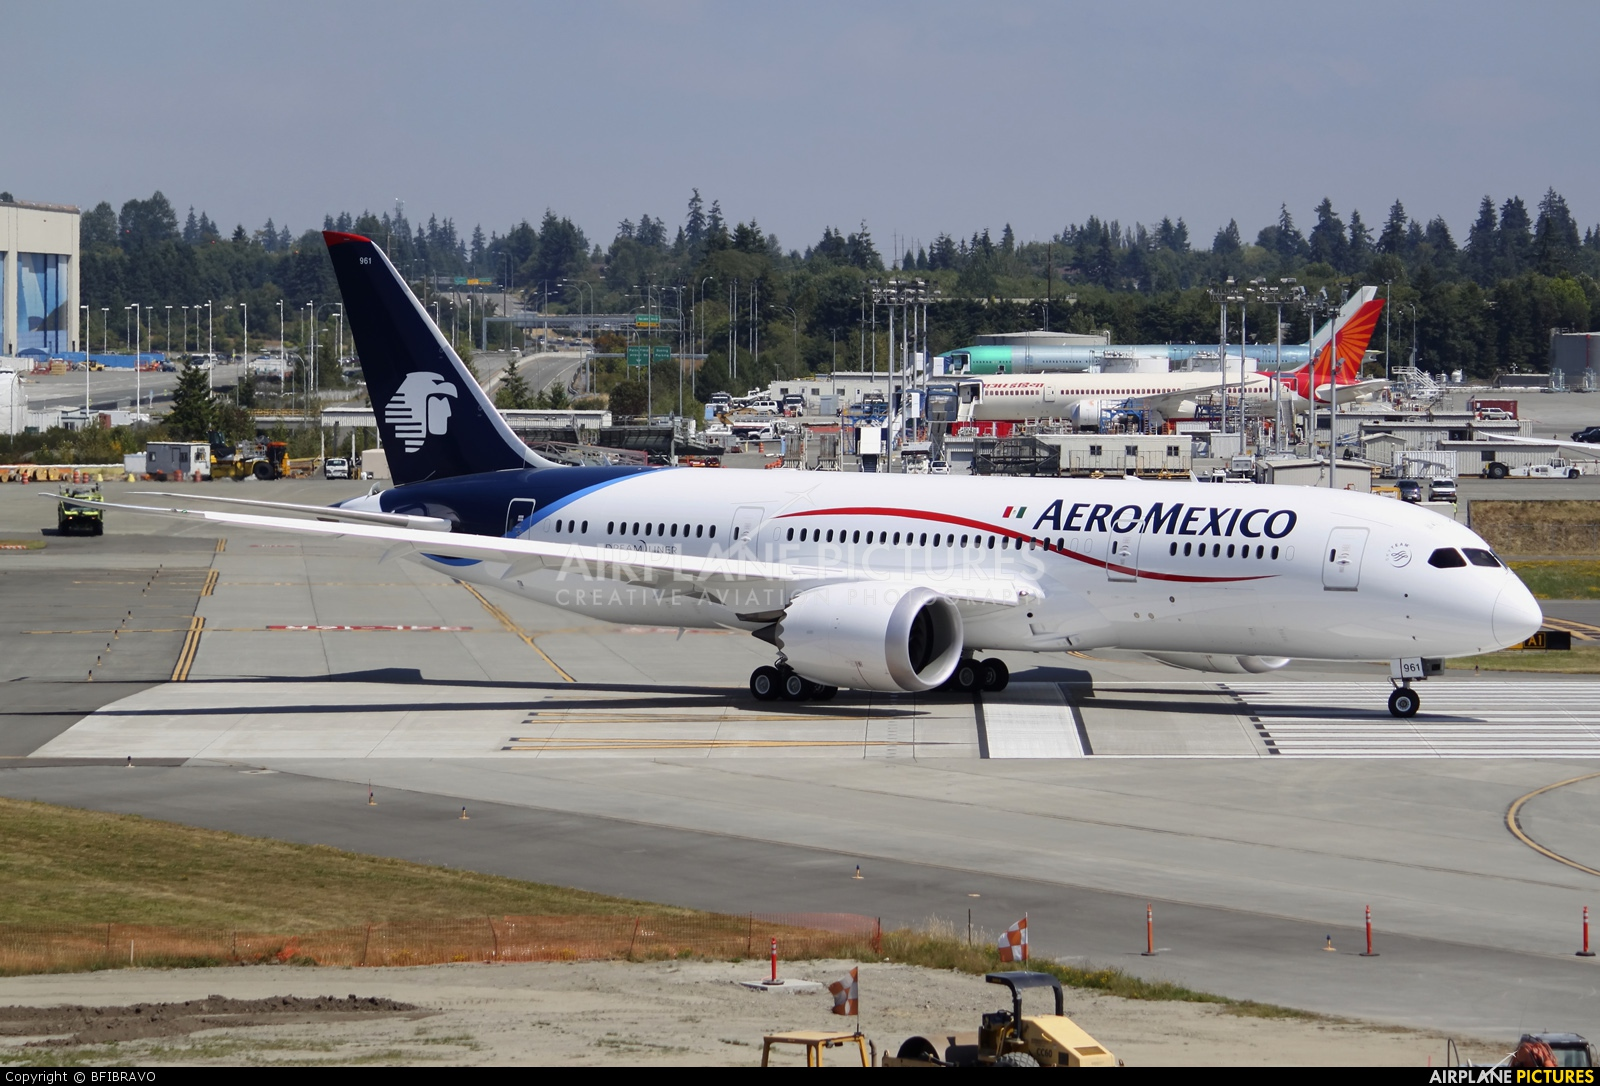 Boeing 787-8 de Aeroméxico Aeromexico-dreamliner-arrives